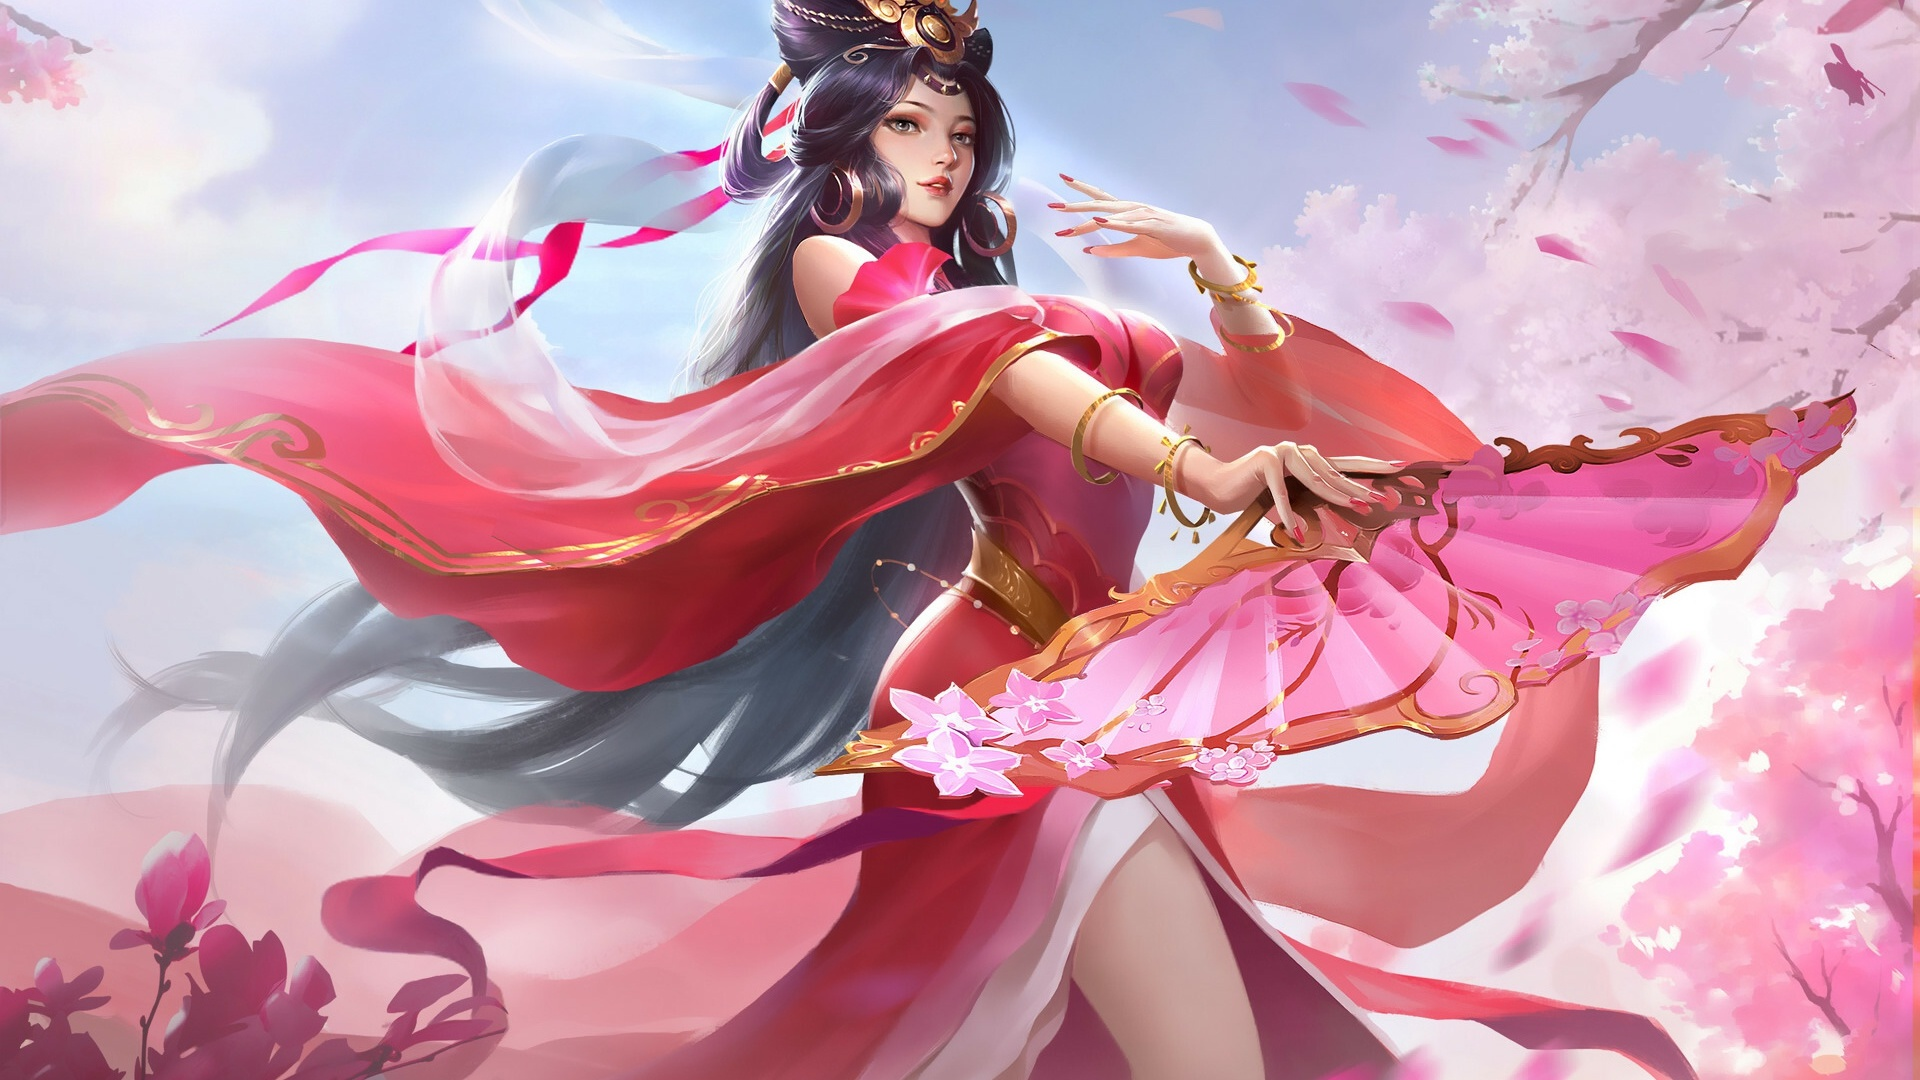 1920x1080 Anime Girl In Chinese Pink Dress Dancing Laptop ...